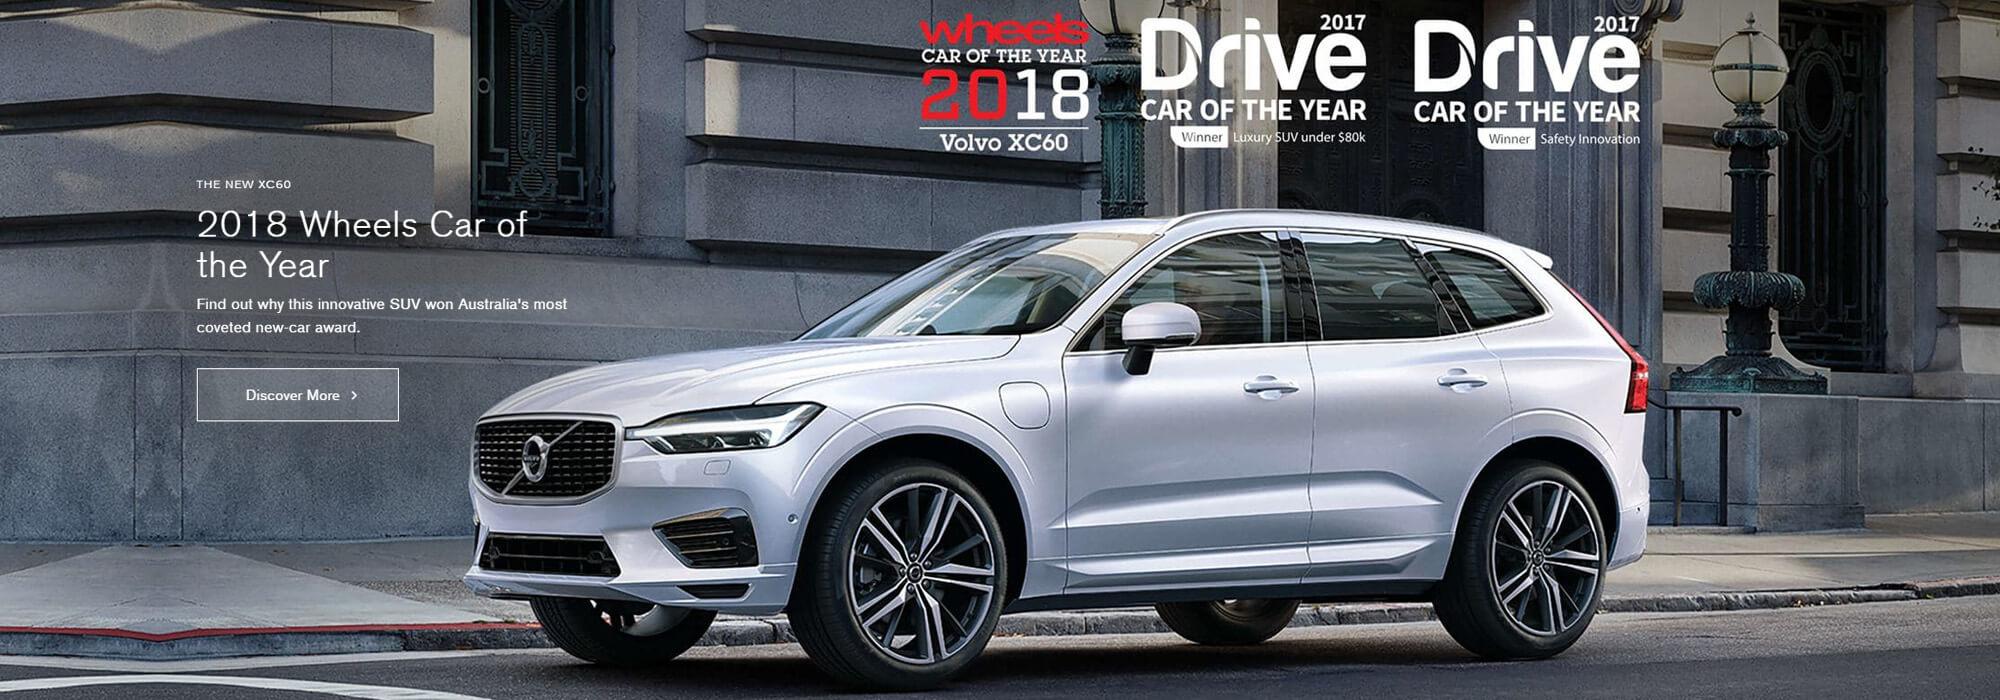 XC60 - Wheels Car of the Year 2018